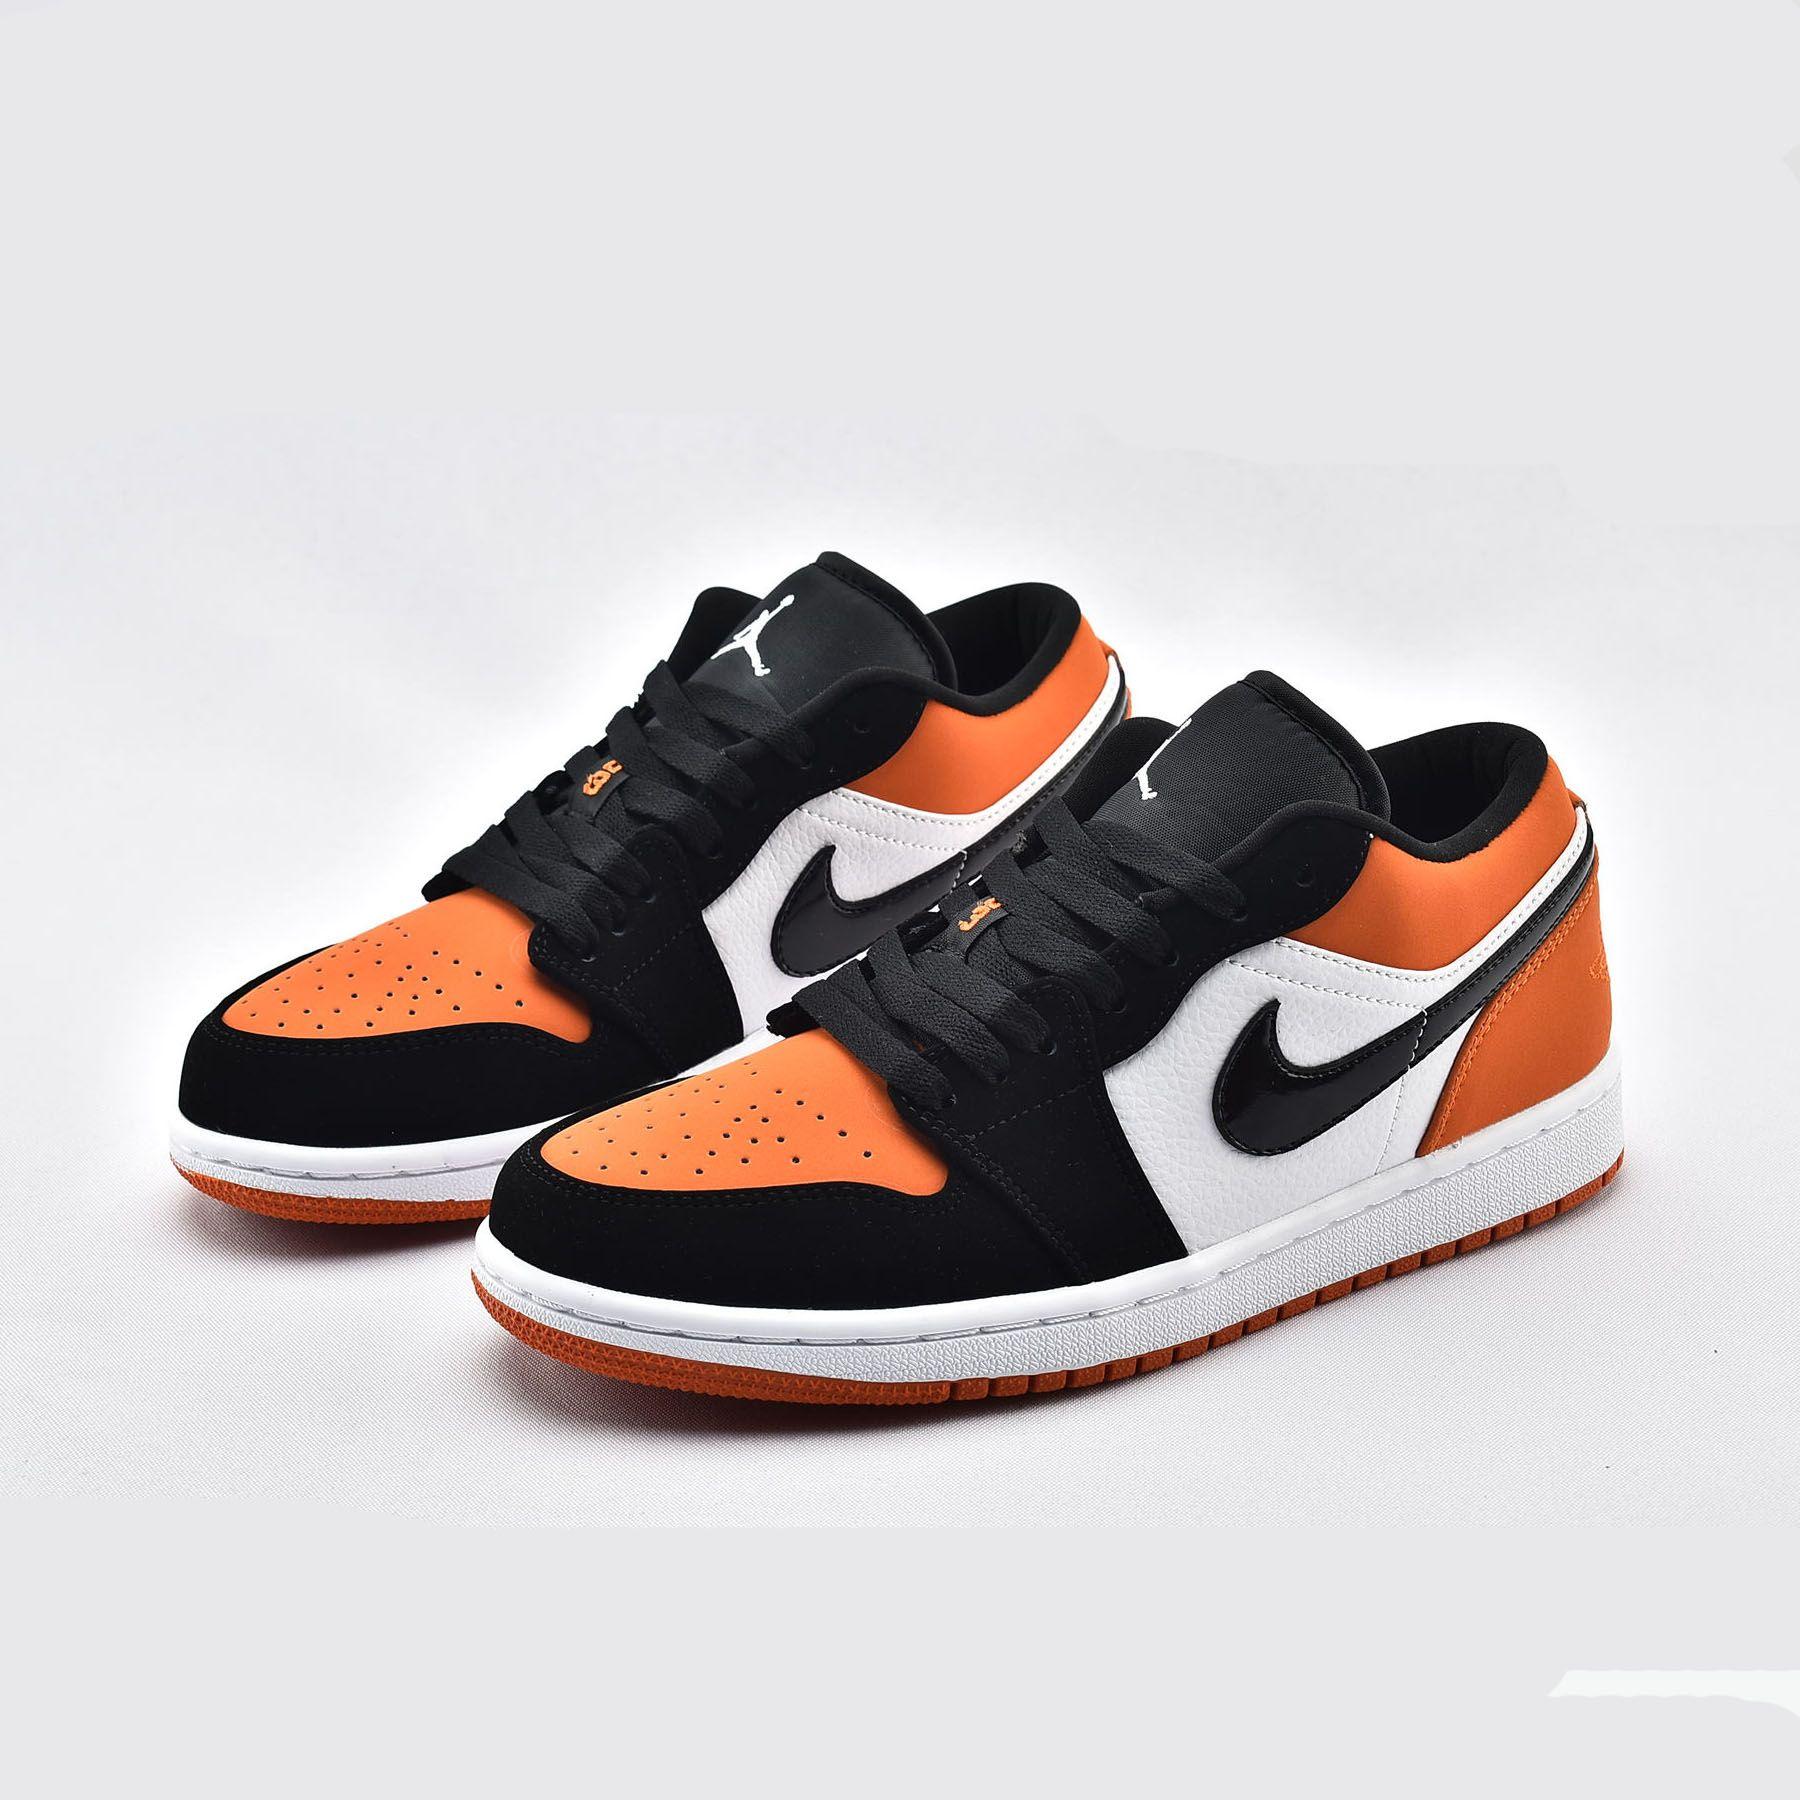 "Air Jordan 1 Low ""Shattered Backboard"" 553558128 Orange"